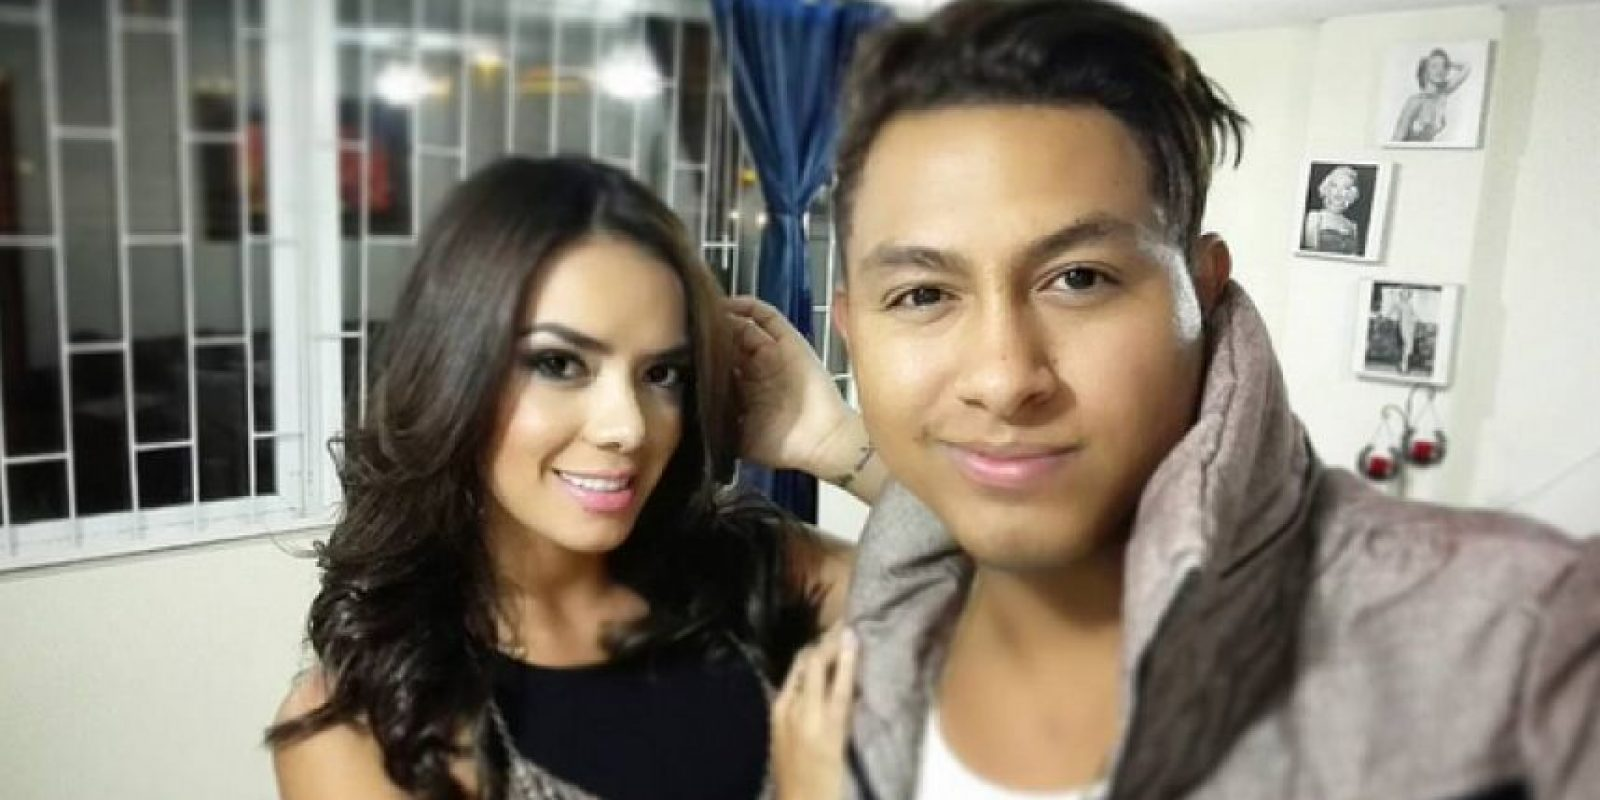 Foto:Instagram.com/elianisgarridozapata